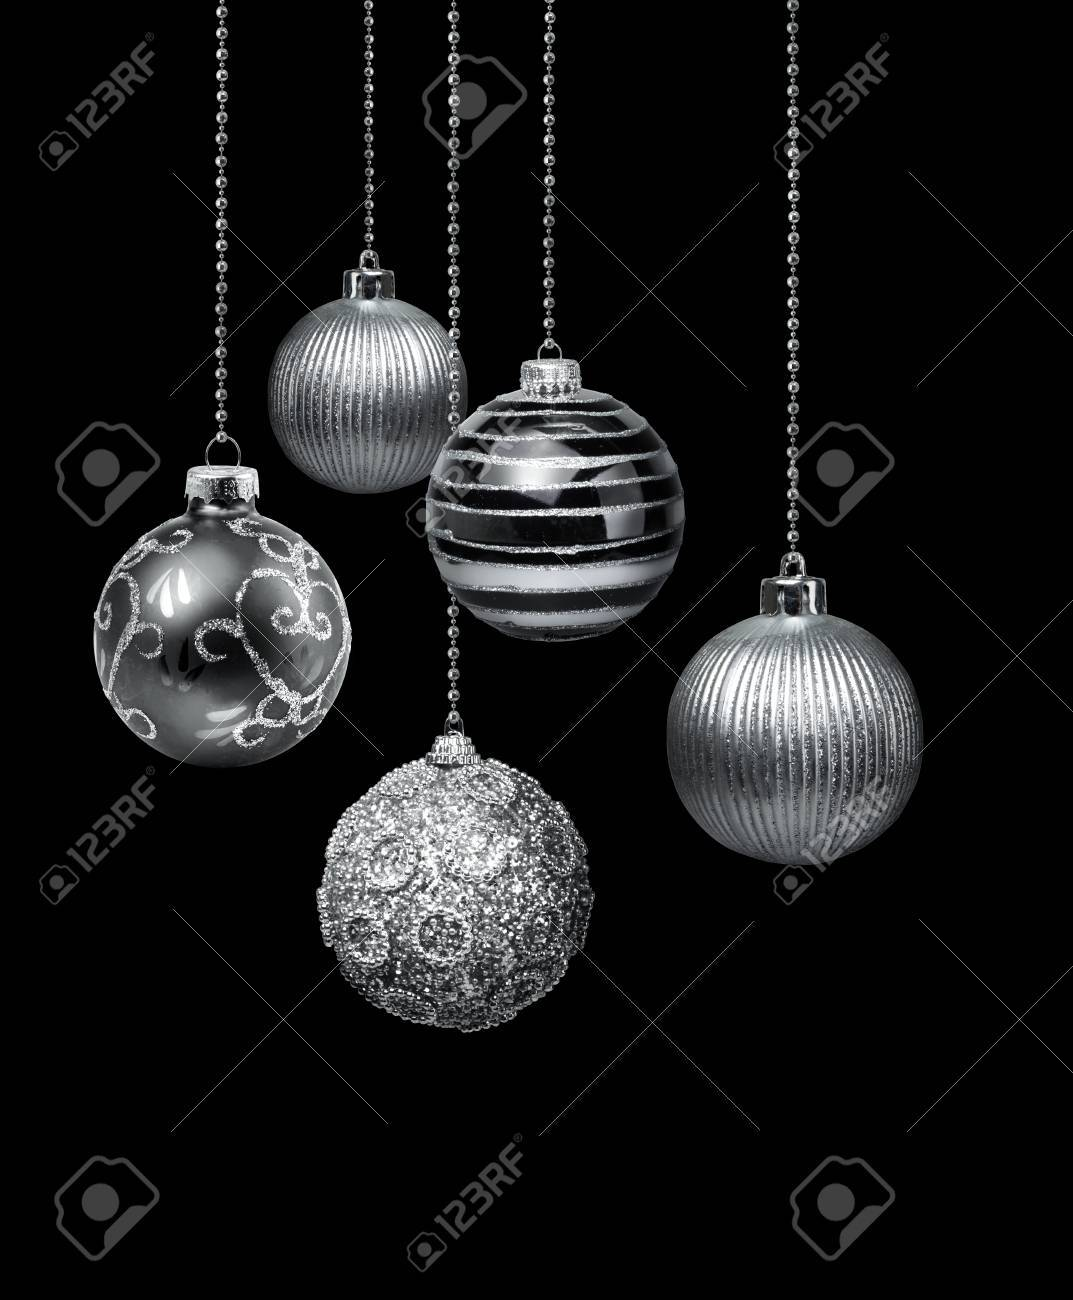 Five Silver Decoration Christmas Balls Hanging Black Background